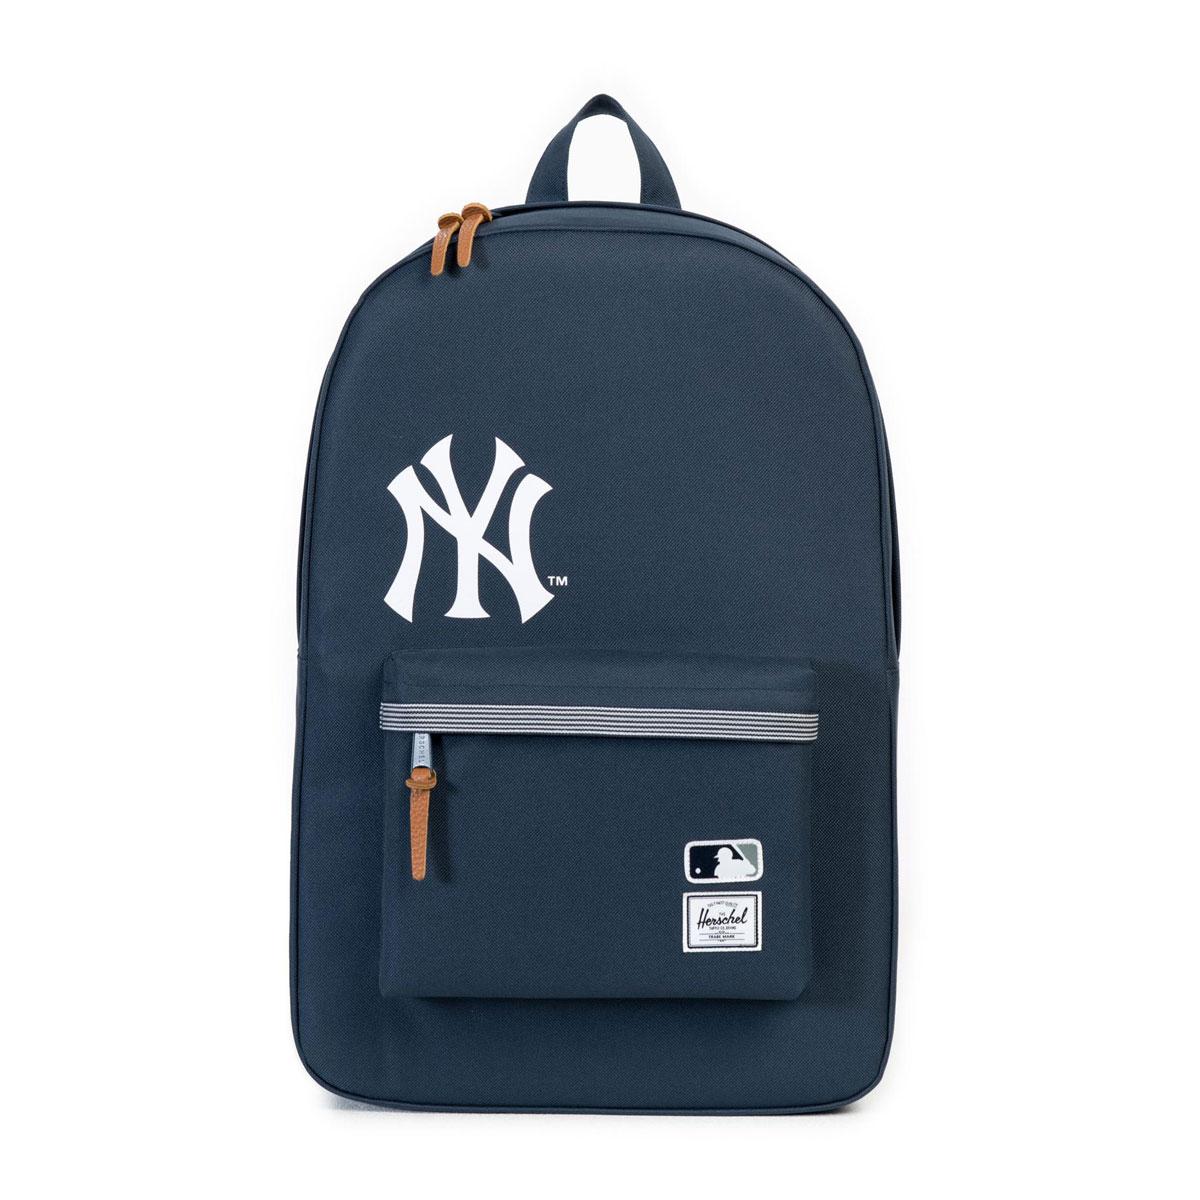 Herschel Supply Co HERITAGE BACKPACK(ハーシェル サプライ ヘリテージ バックパック)New York Yankees【メンズ レディース バックパック】18SP-I